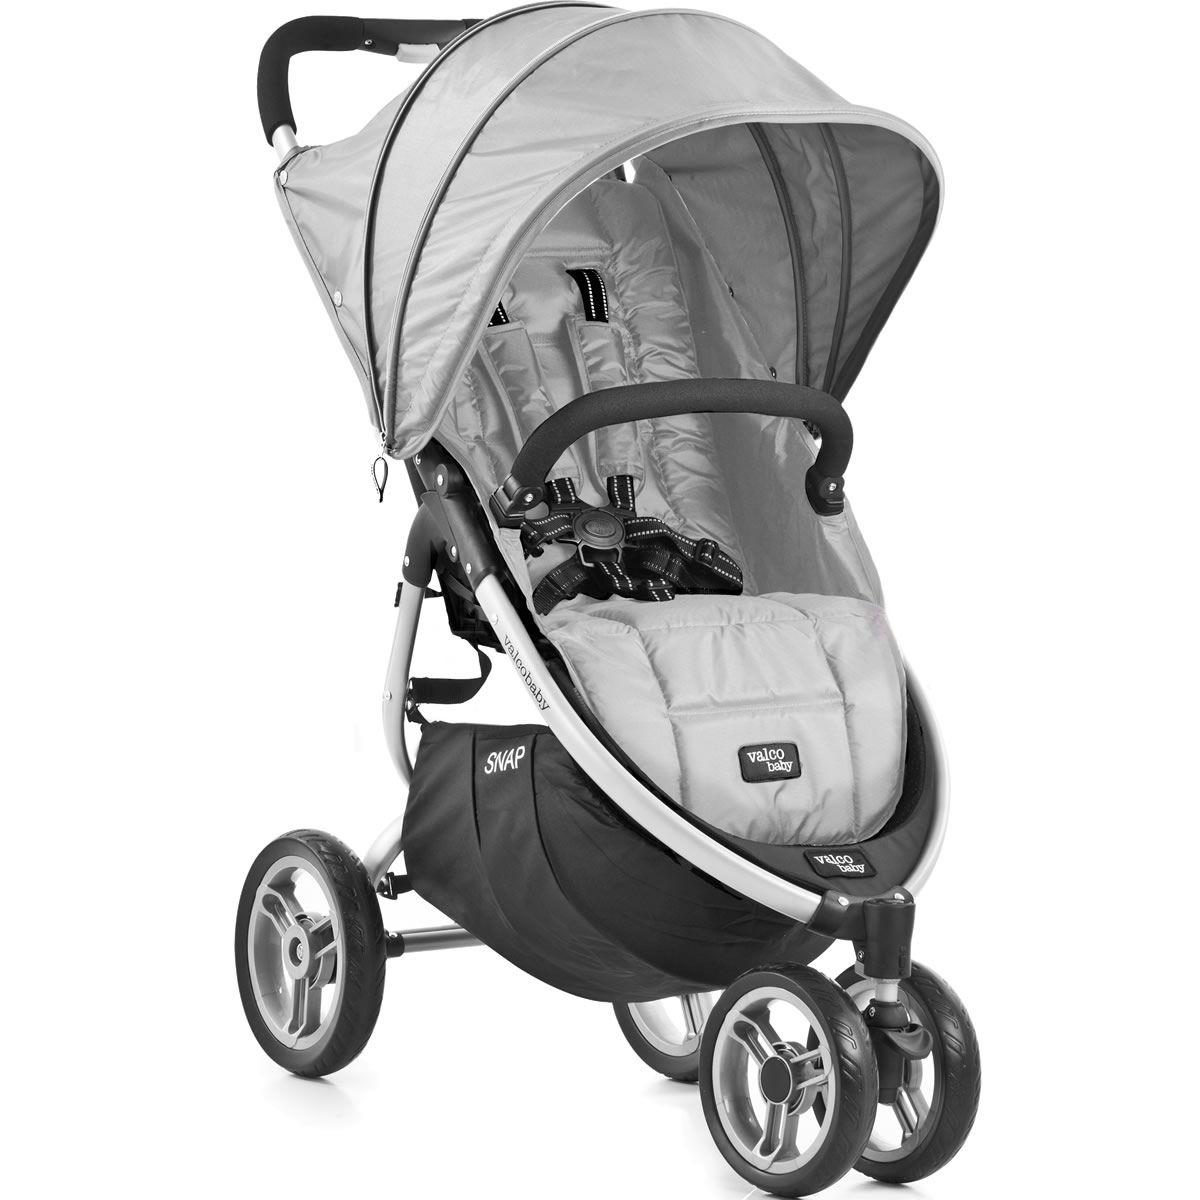 Valco Snap Single Stroller Silver Single stroller